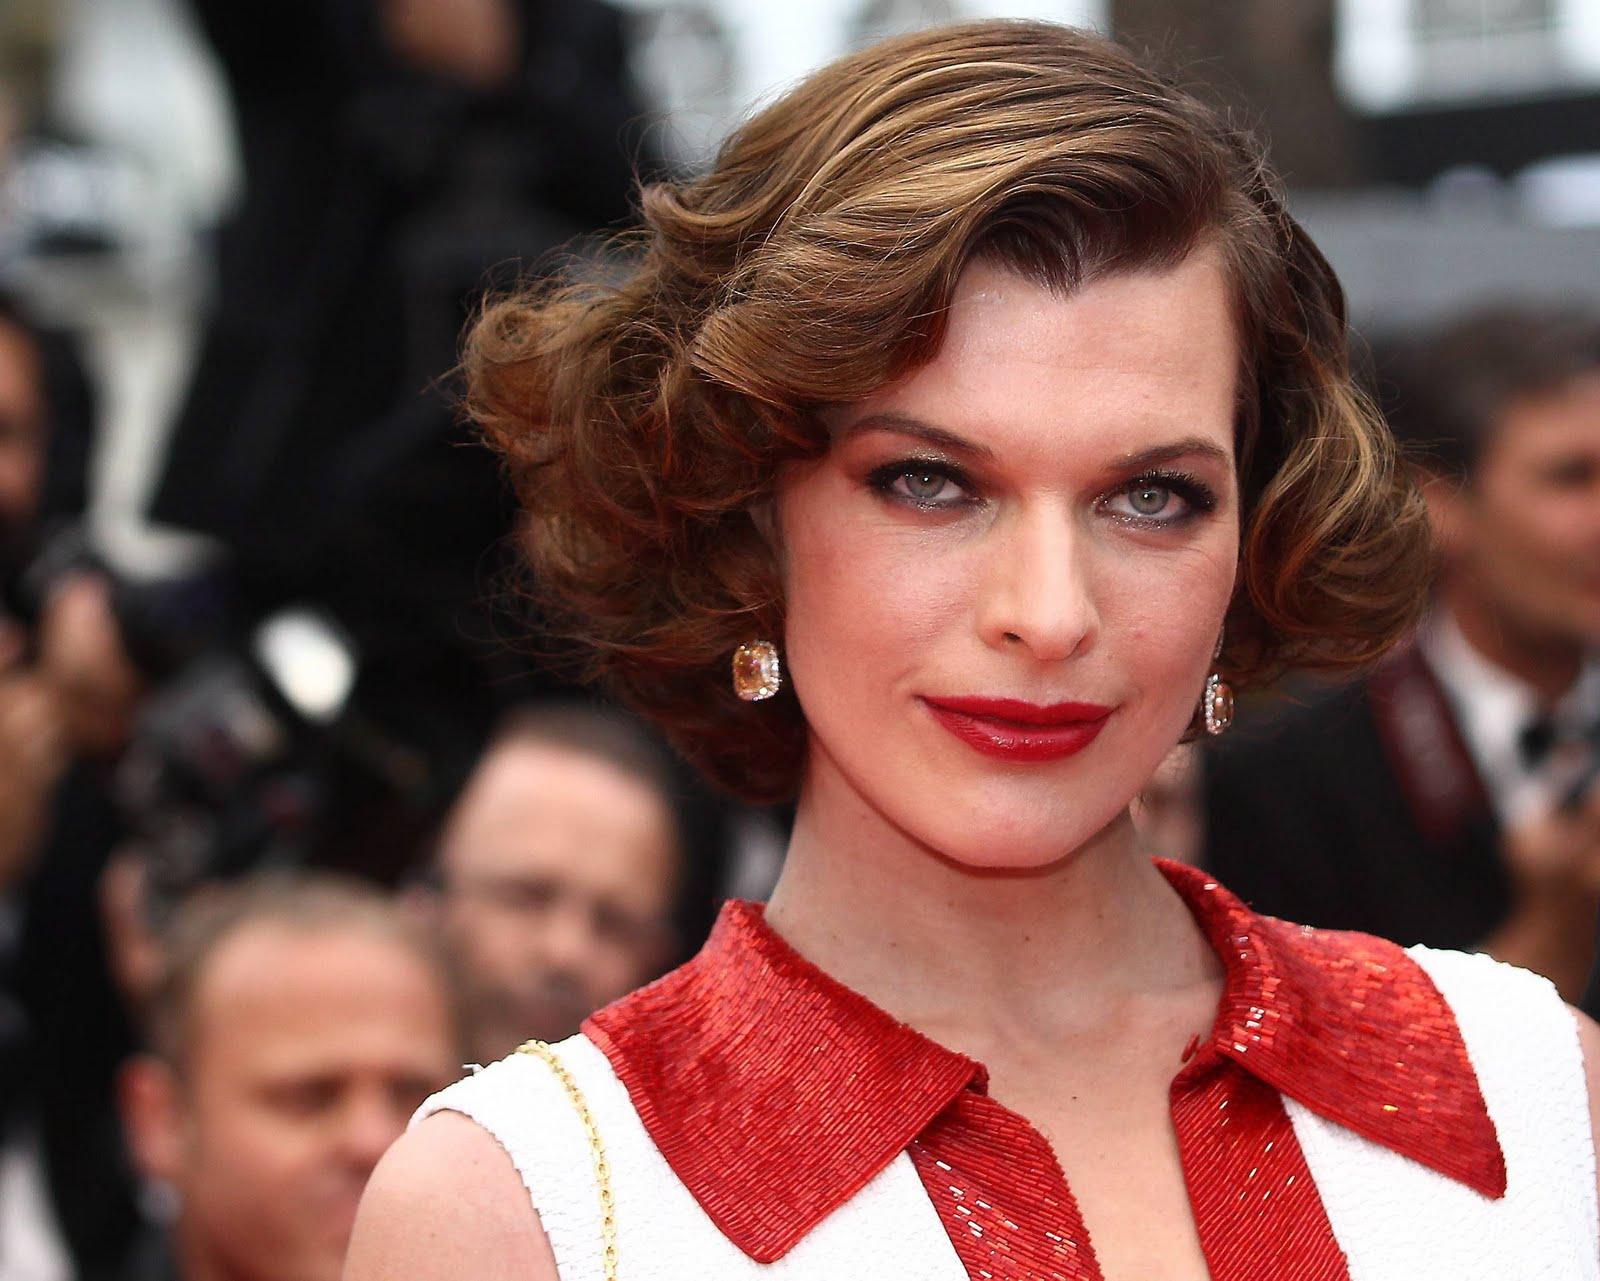 http://3.bp.blogspot.com/-kWyuoONLl7g/TdVjC2nPAQI/AAAAAAAAEHw/szf14wiLYTg/s1600/Kurupt_Milla_Jovovich_Screening_of_La_Conquete_Cannes_12.jpg